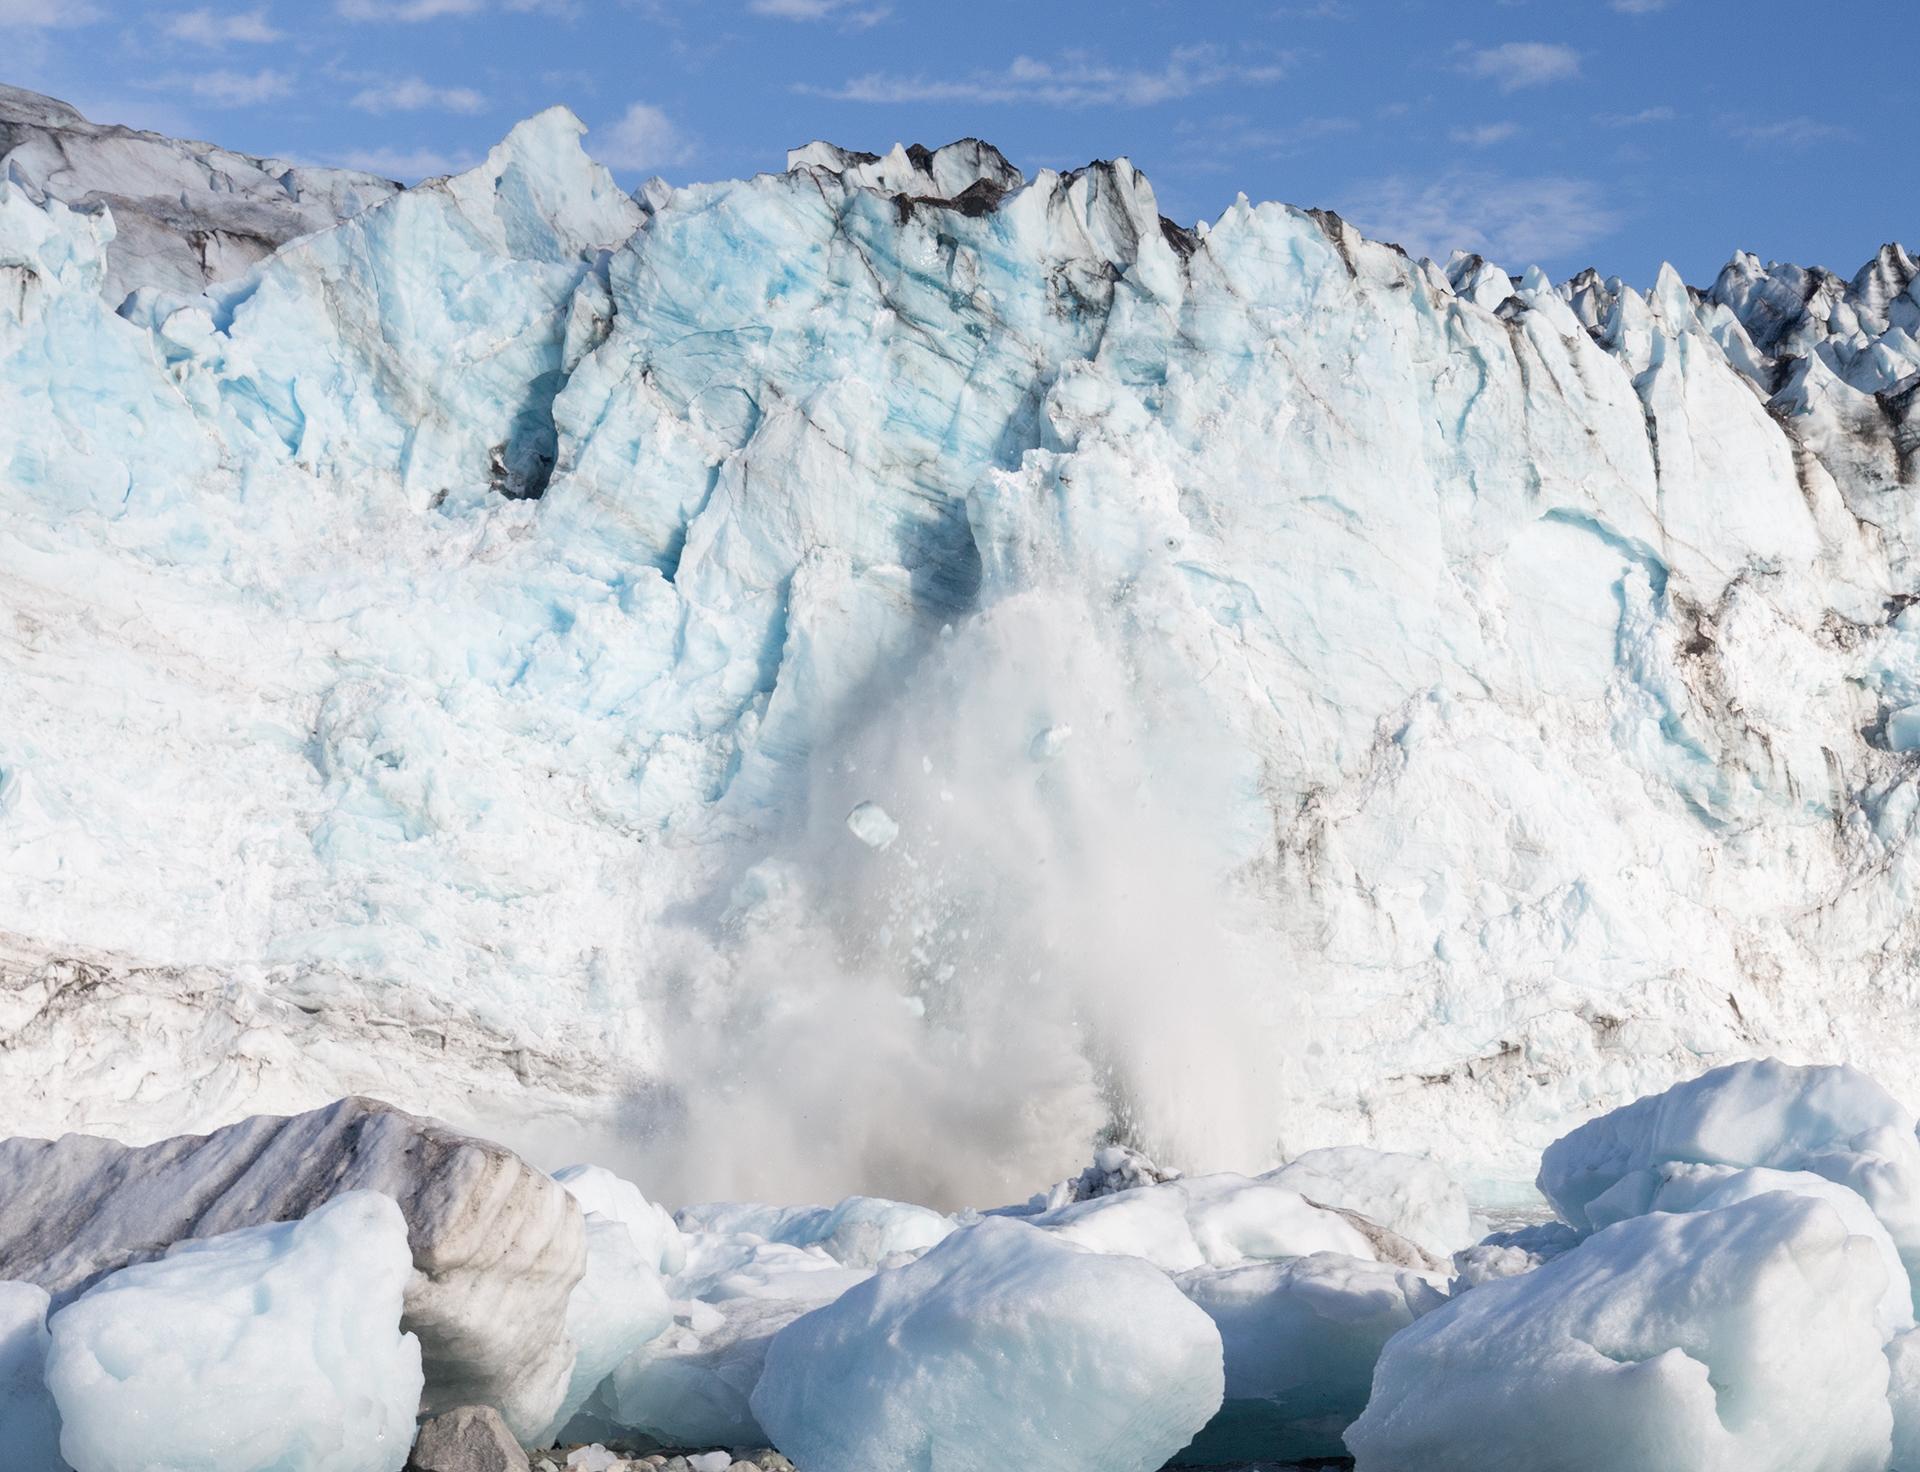 Lamplugh Glacier calving